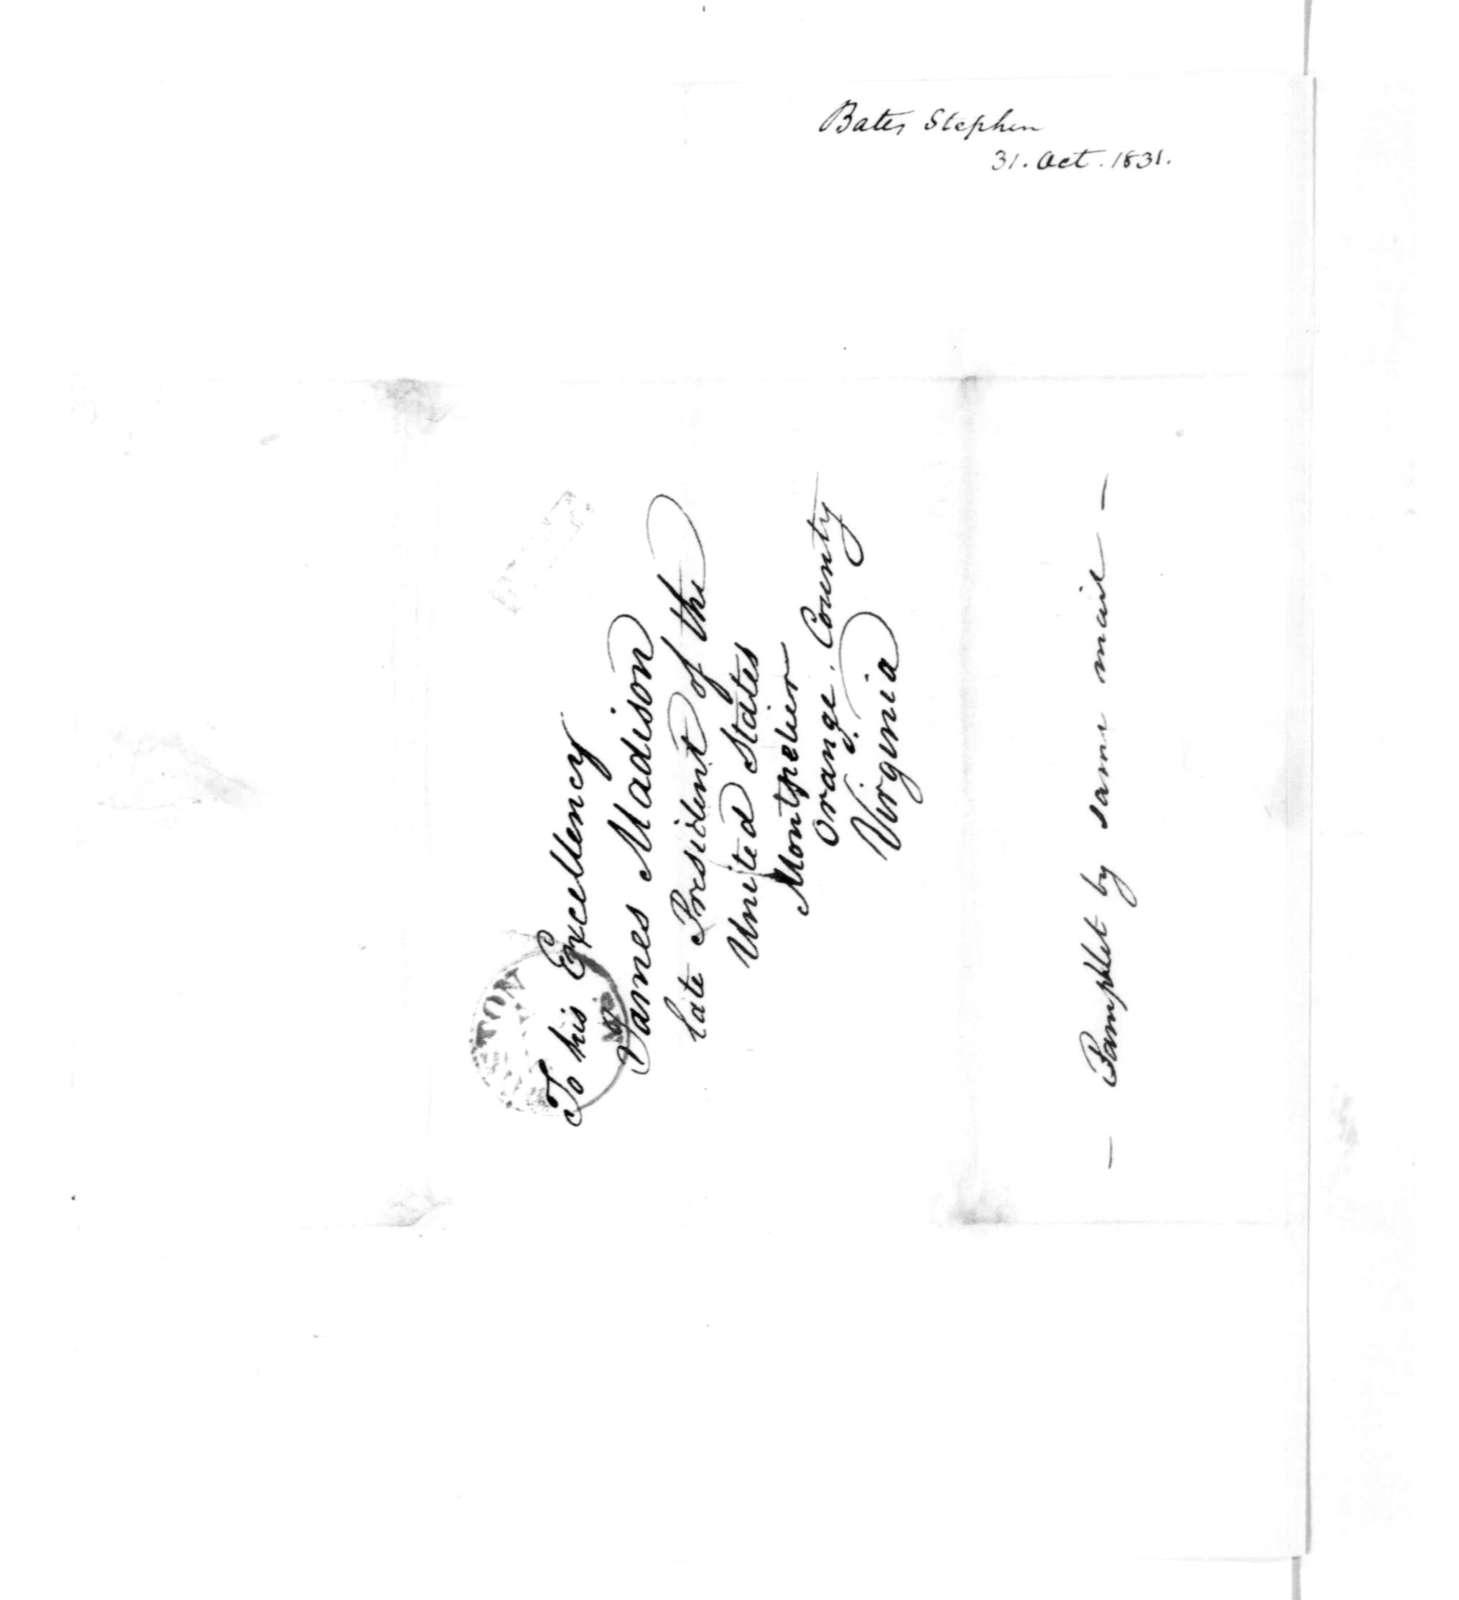 James Madison to Stephen Bates, October 31, 1831.